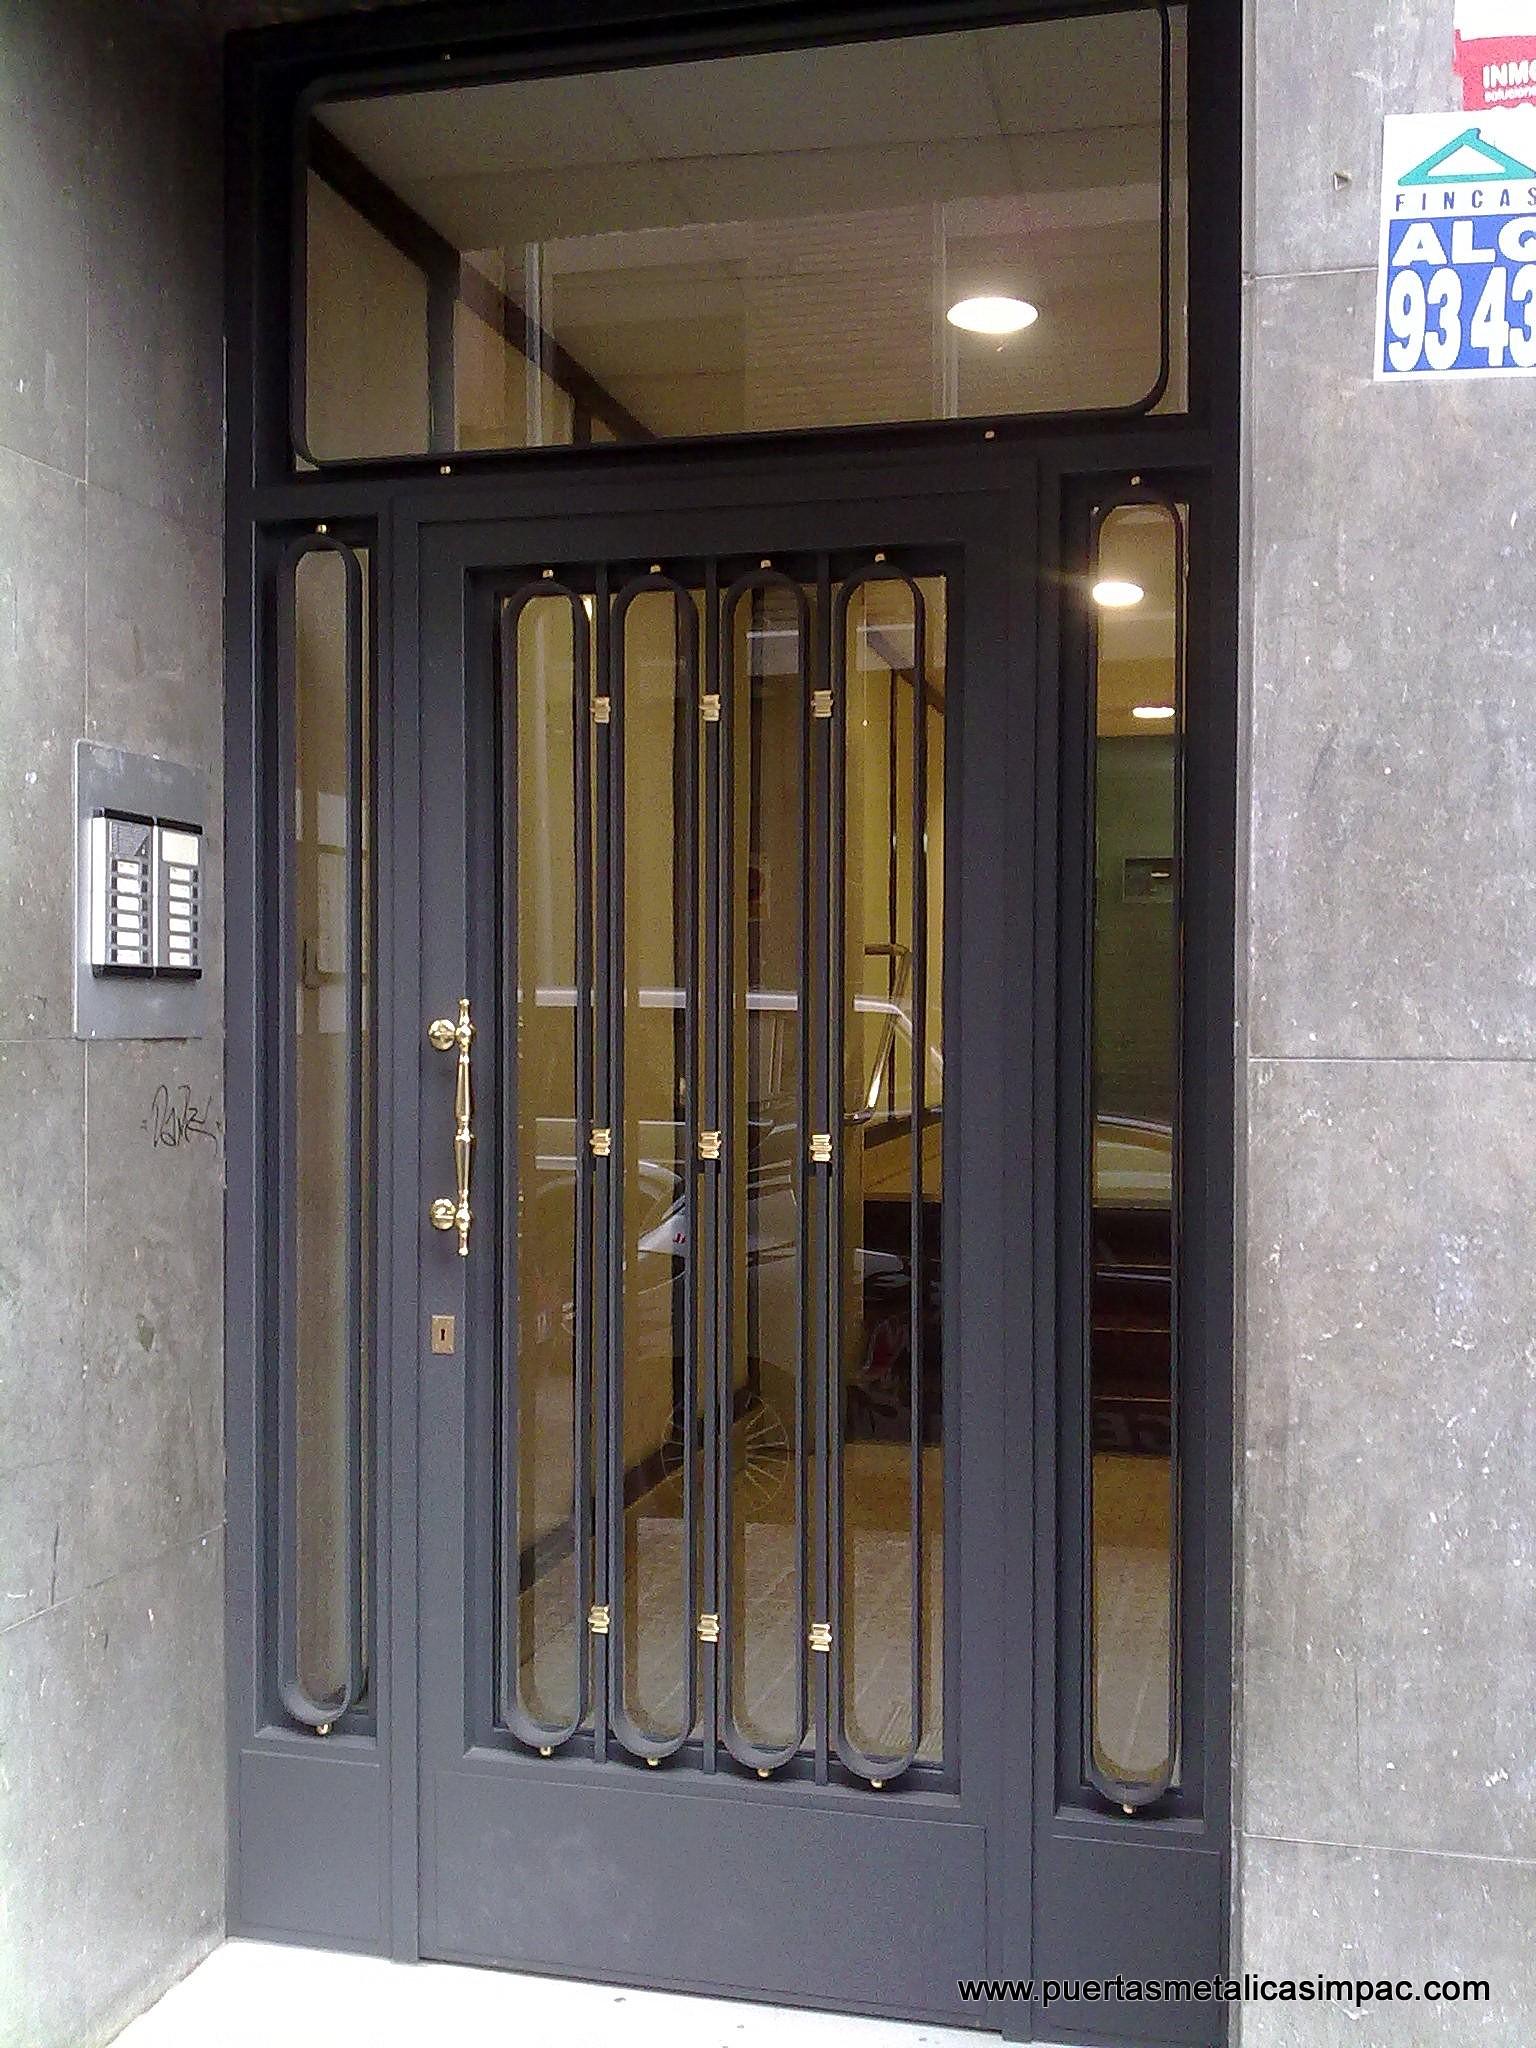 Cerrajeria impac s p c puertas met licas fabricaci n for Ver modelos de puertas